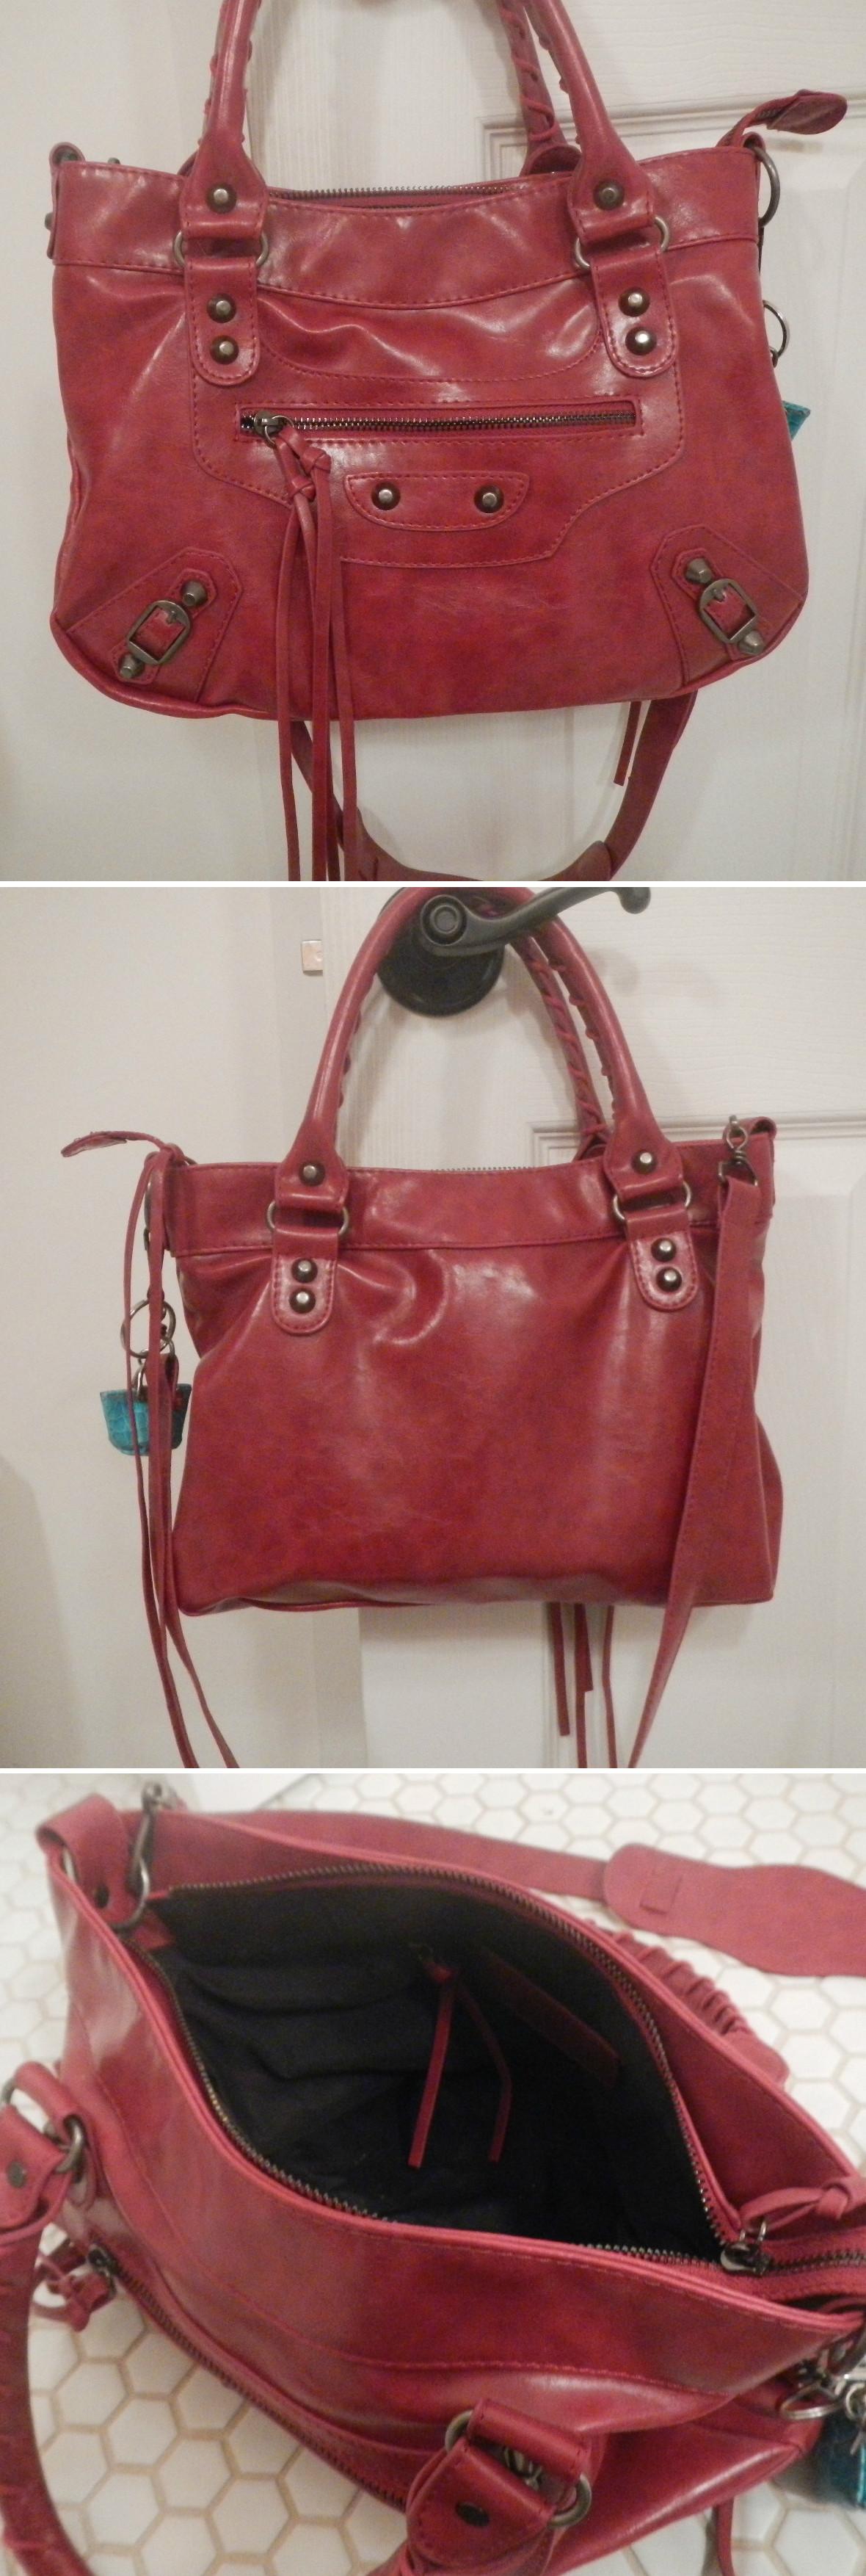 How Good Are You At Authenticating Bags Handbag Balenciaga City Bag